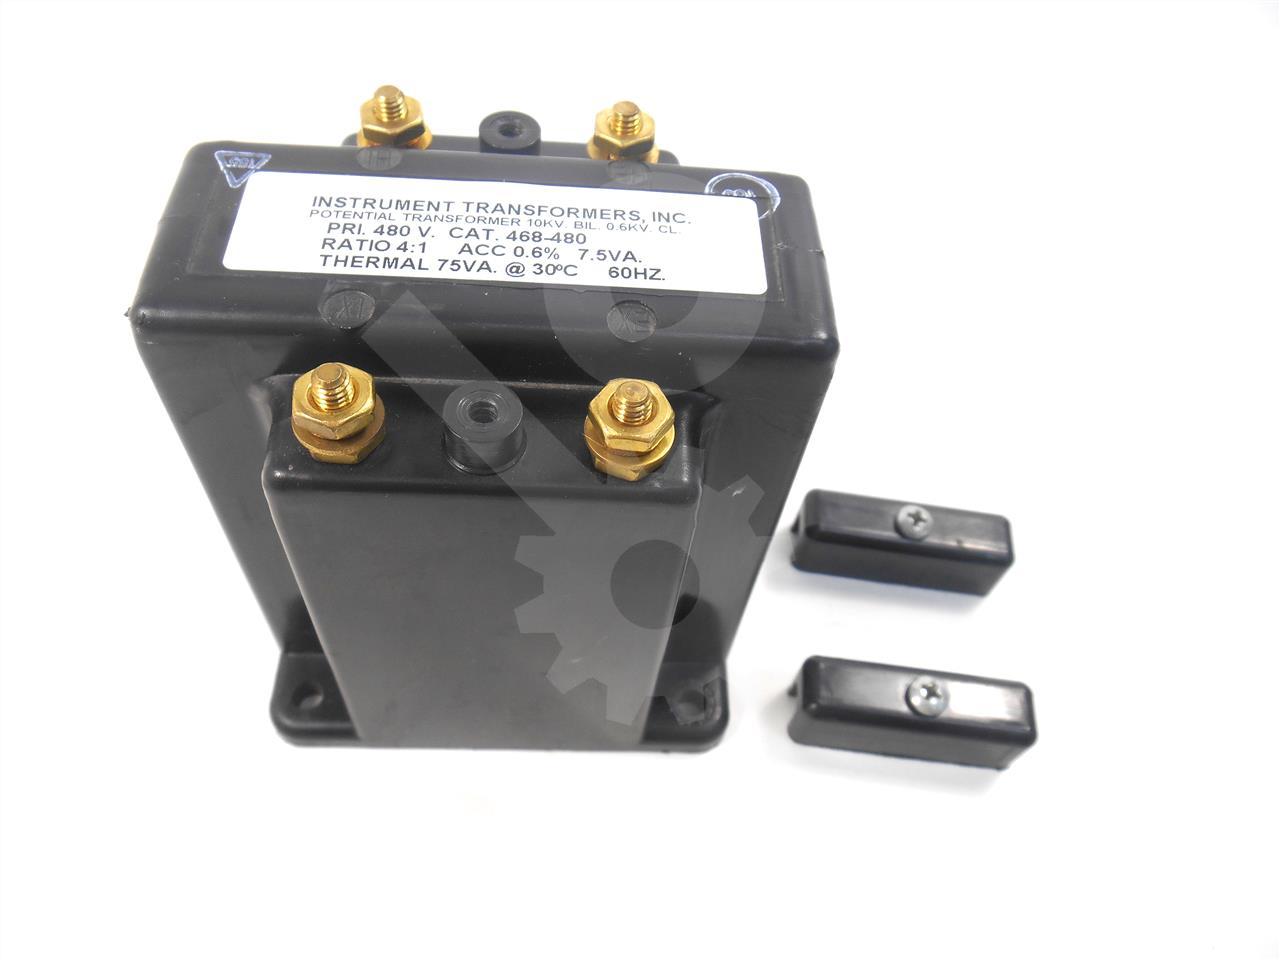 Instrument Transformer ITI 4:1 POTENTIAL TRANSFORMER ...